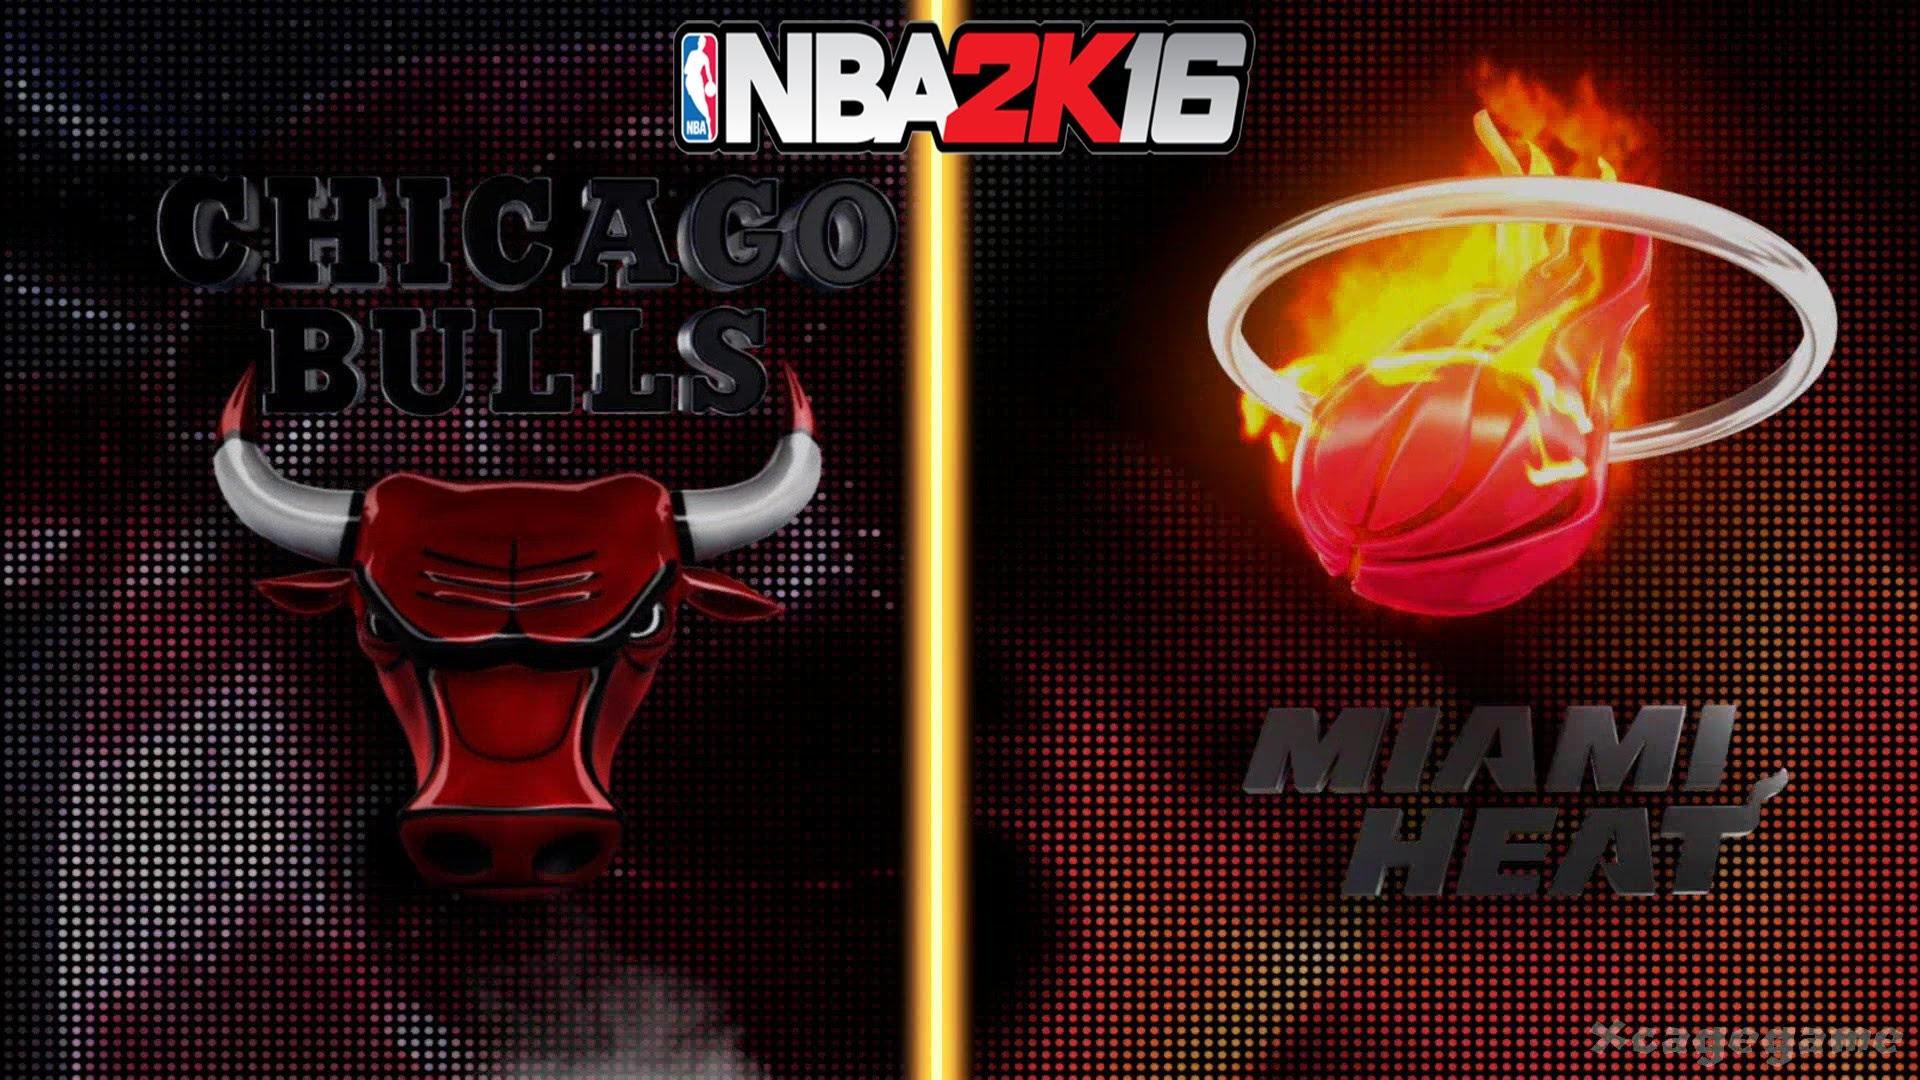 Icb2c46 Intro Chicago Bulls 2020 Clipart Today 1586675920